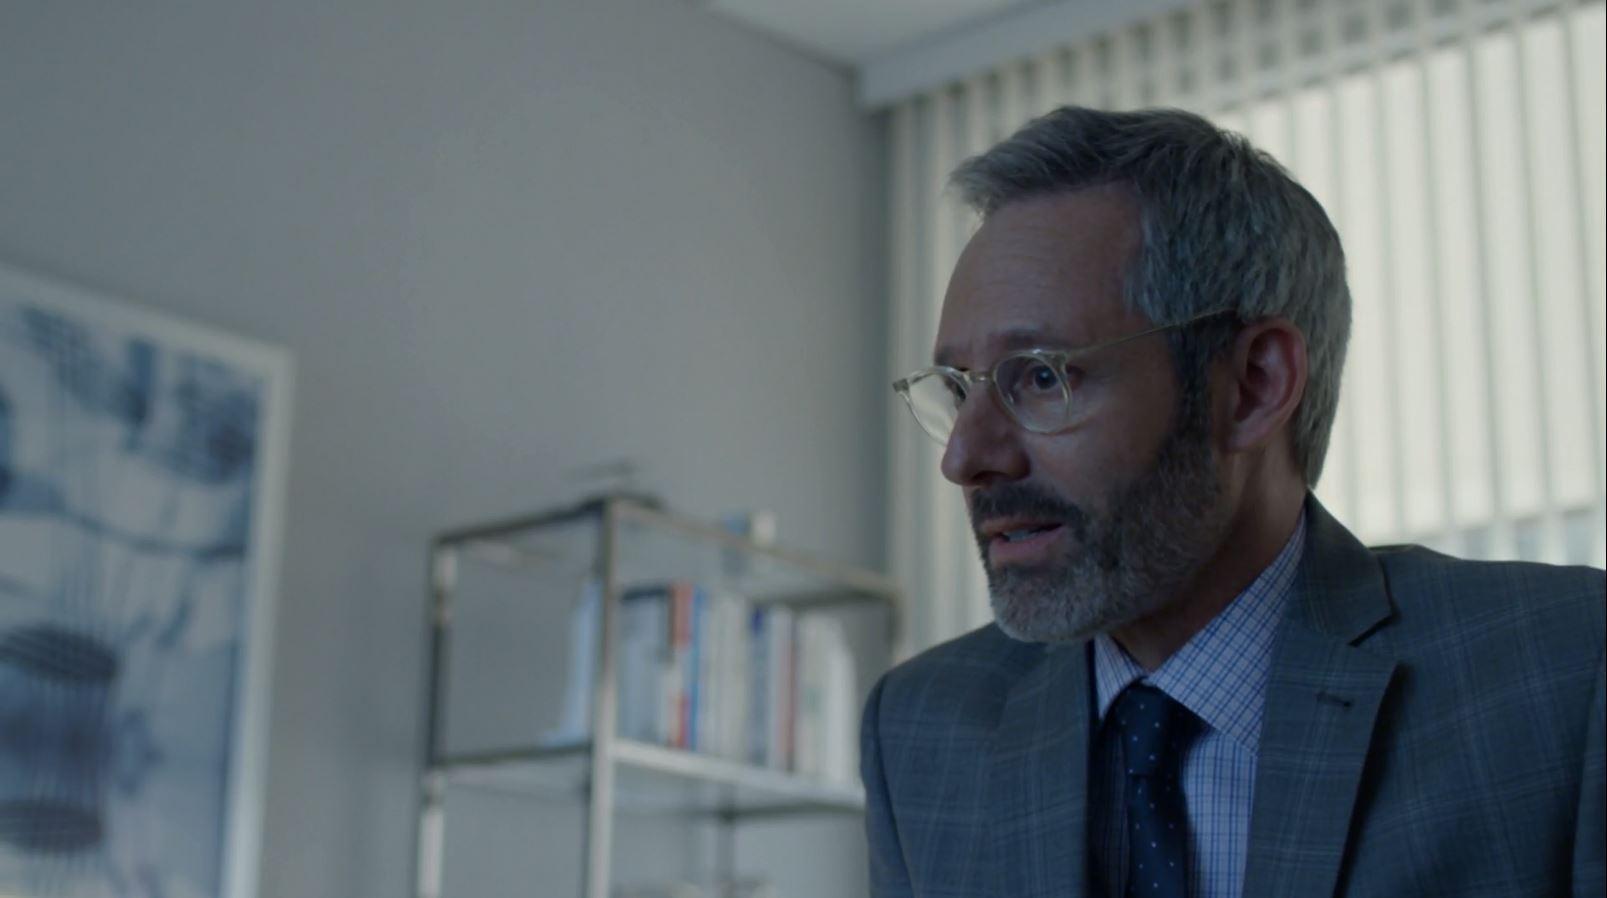 Michel-Gill-as-Gideon-Goddard.-Mr.-Robot-Episode-2-Review